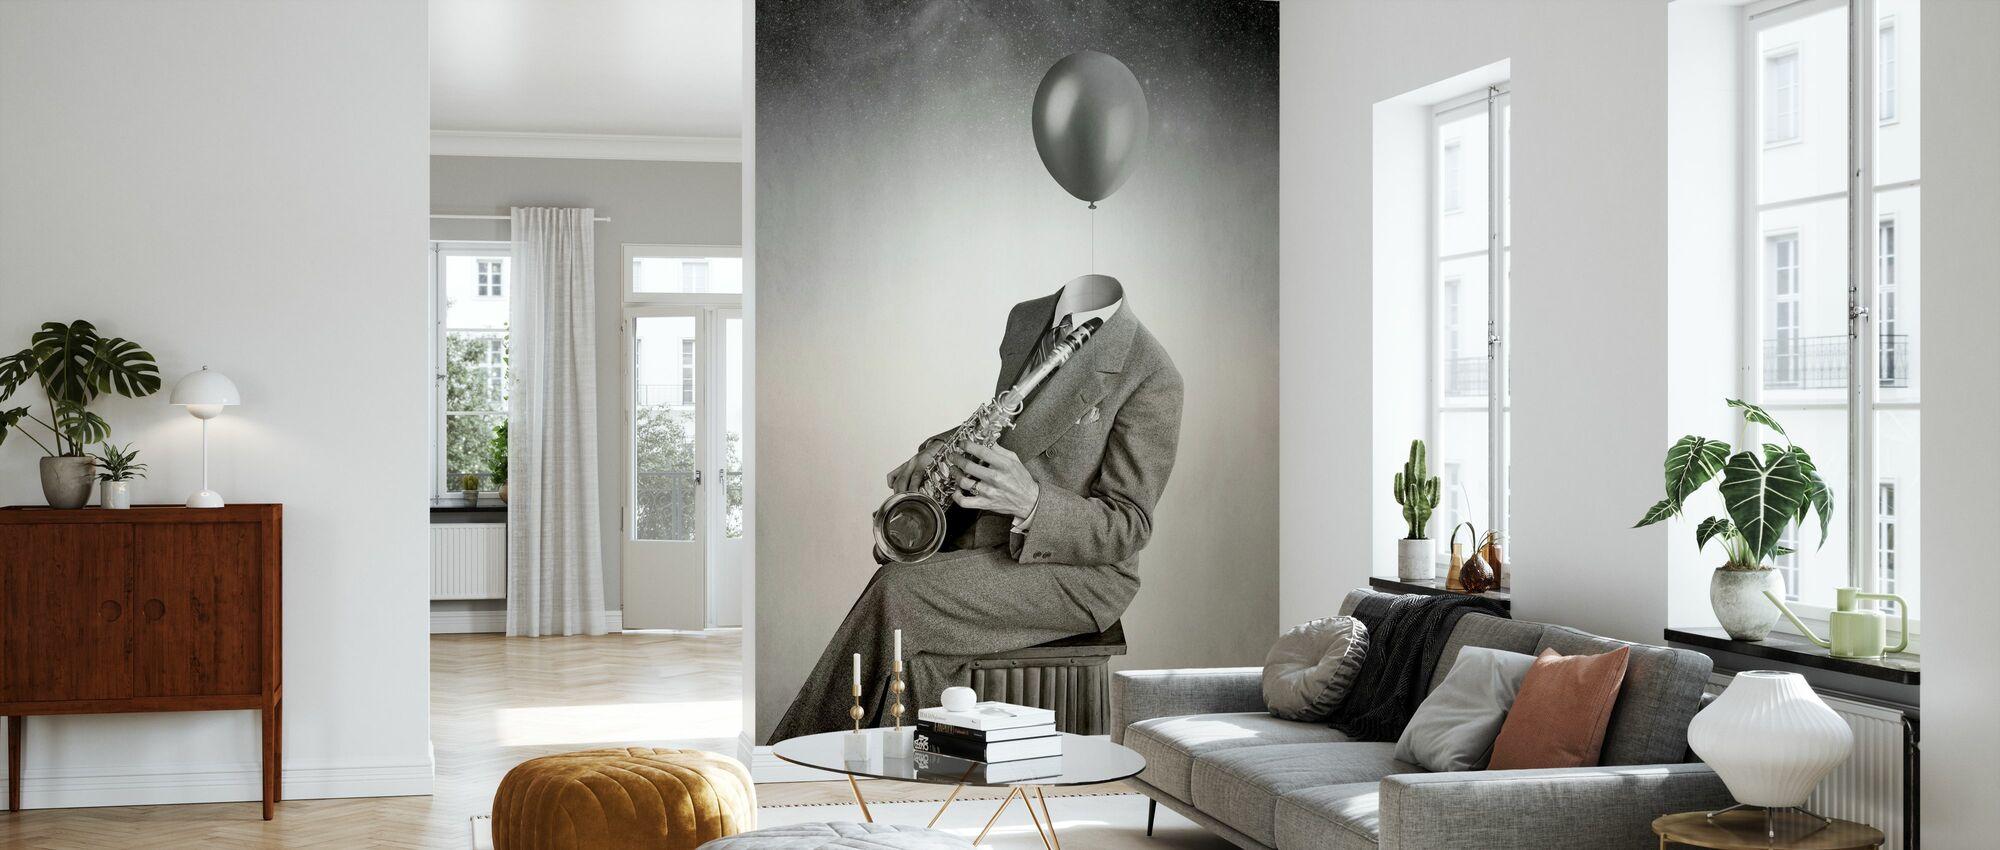 Ballon - Papier peint - Salle à manger